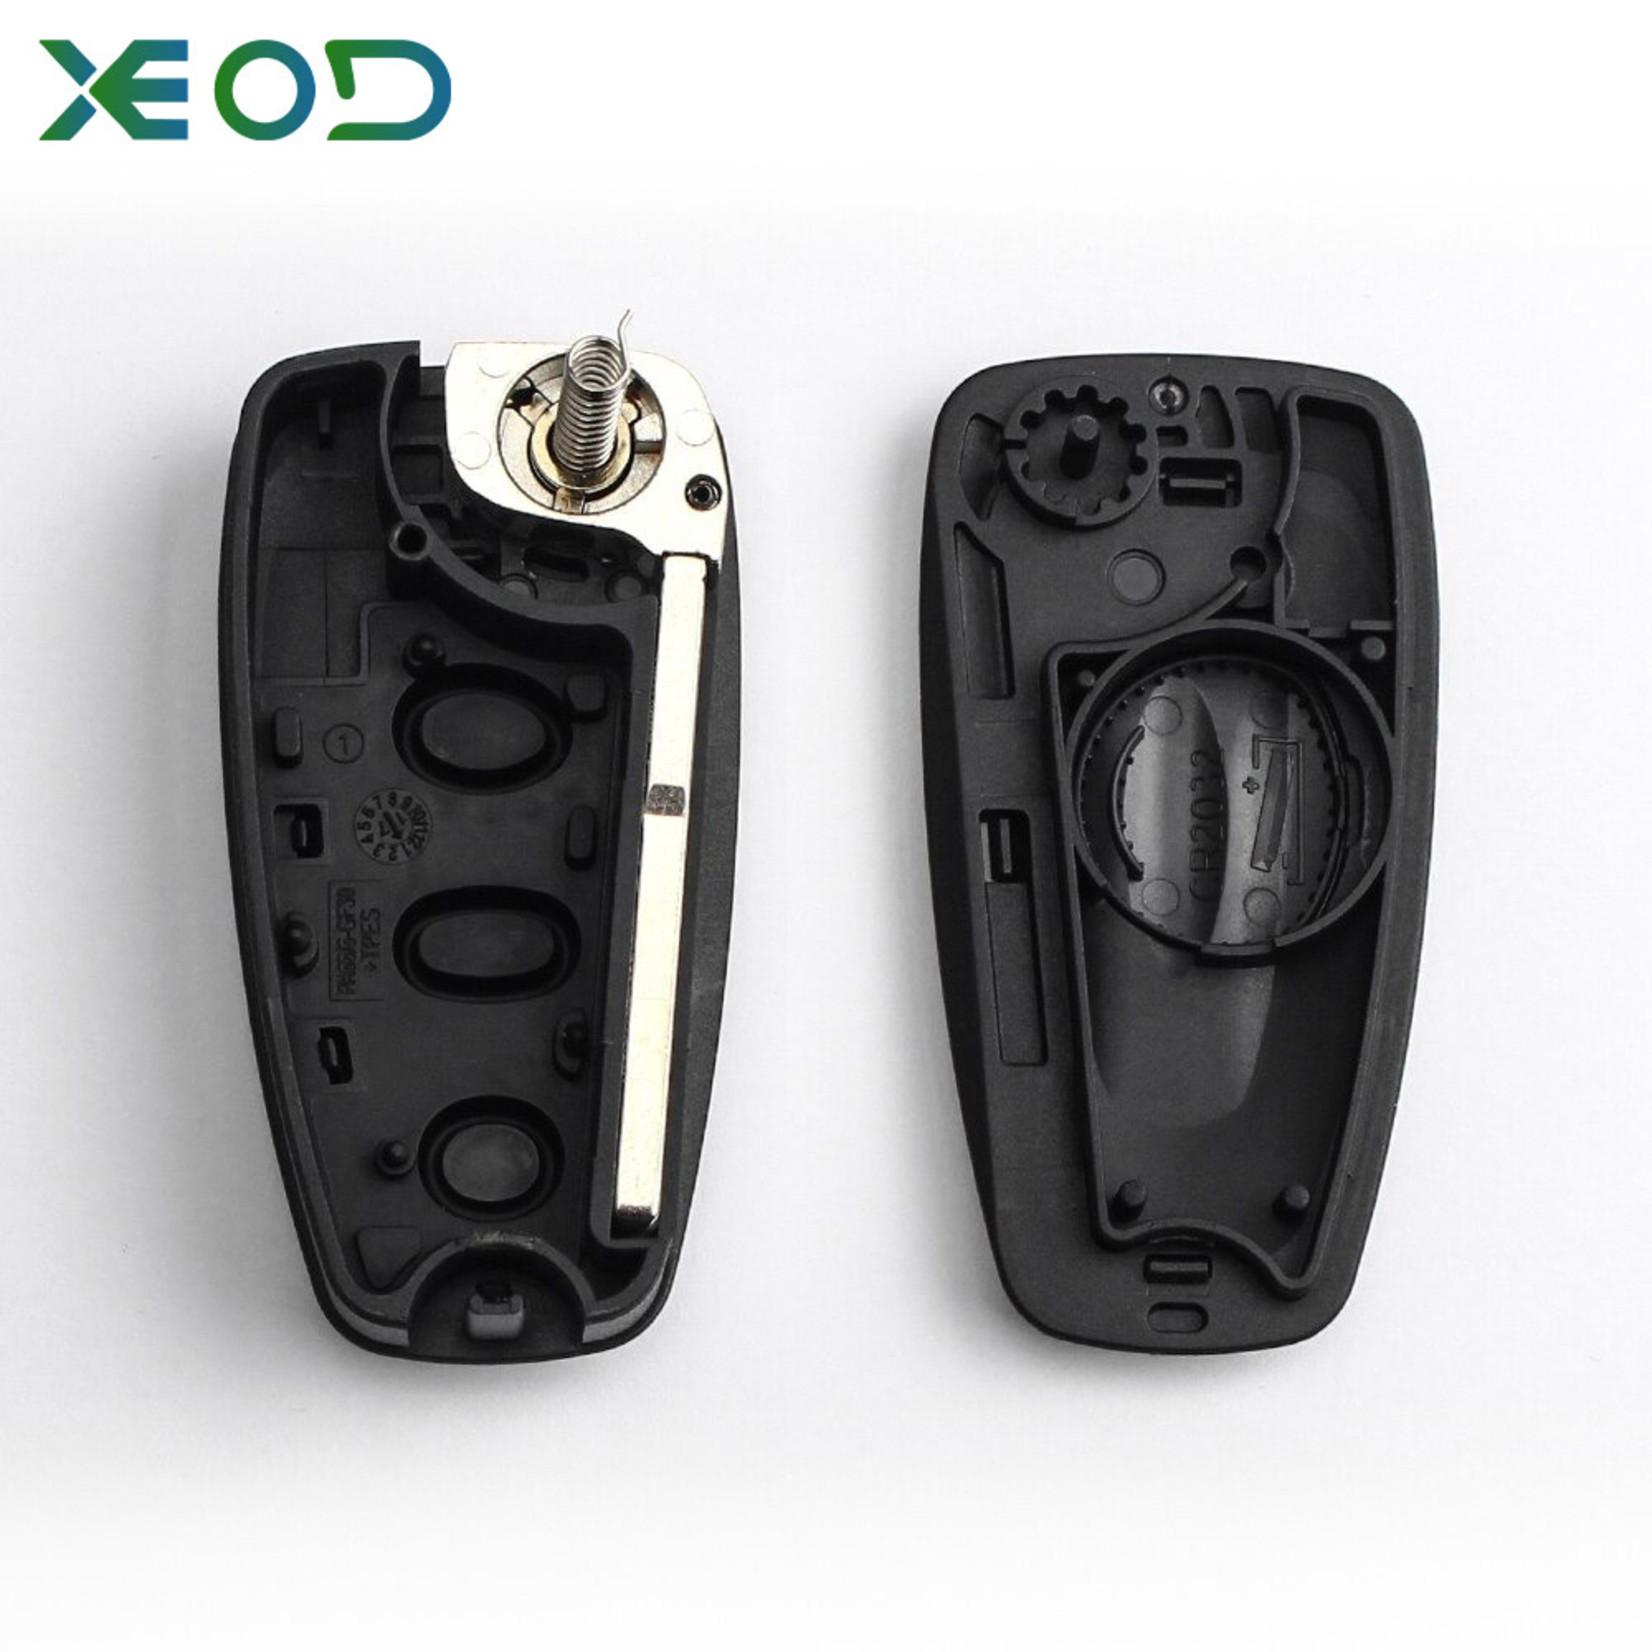 XEOD Ford klap sleutelbehuizing 3-knops model 2